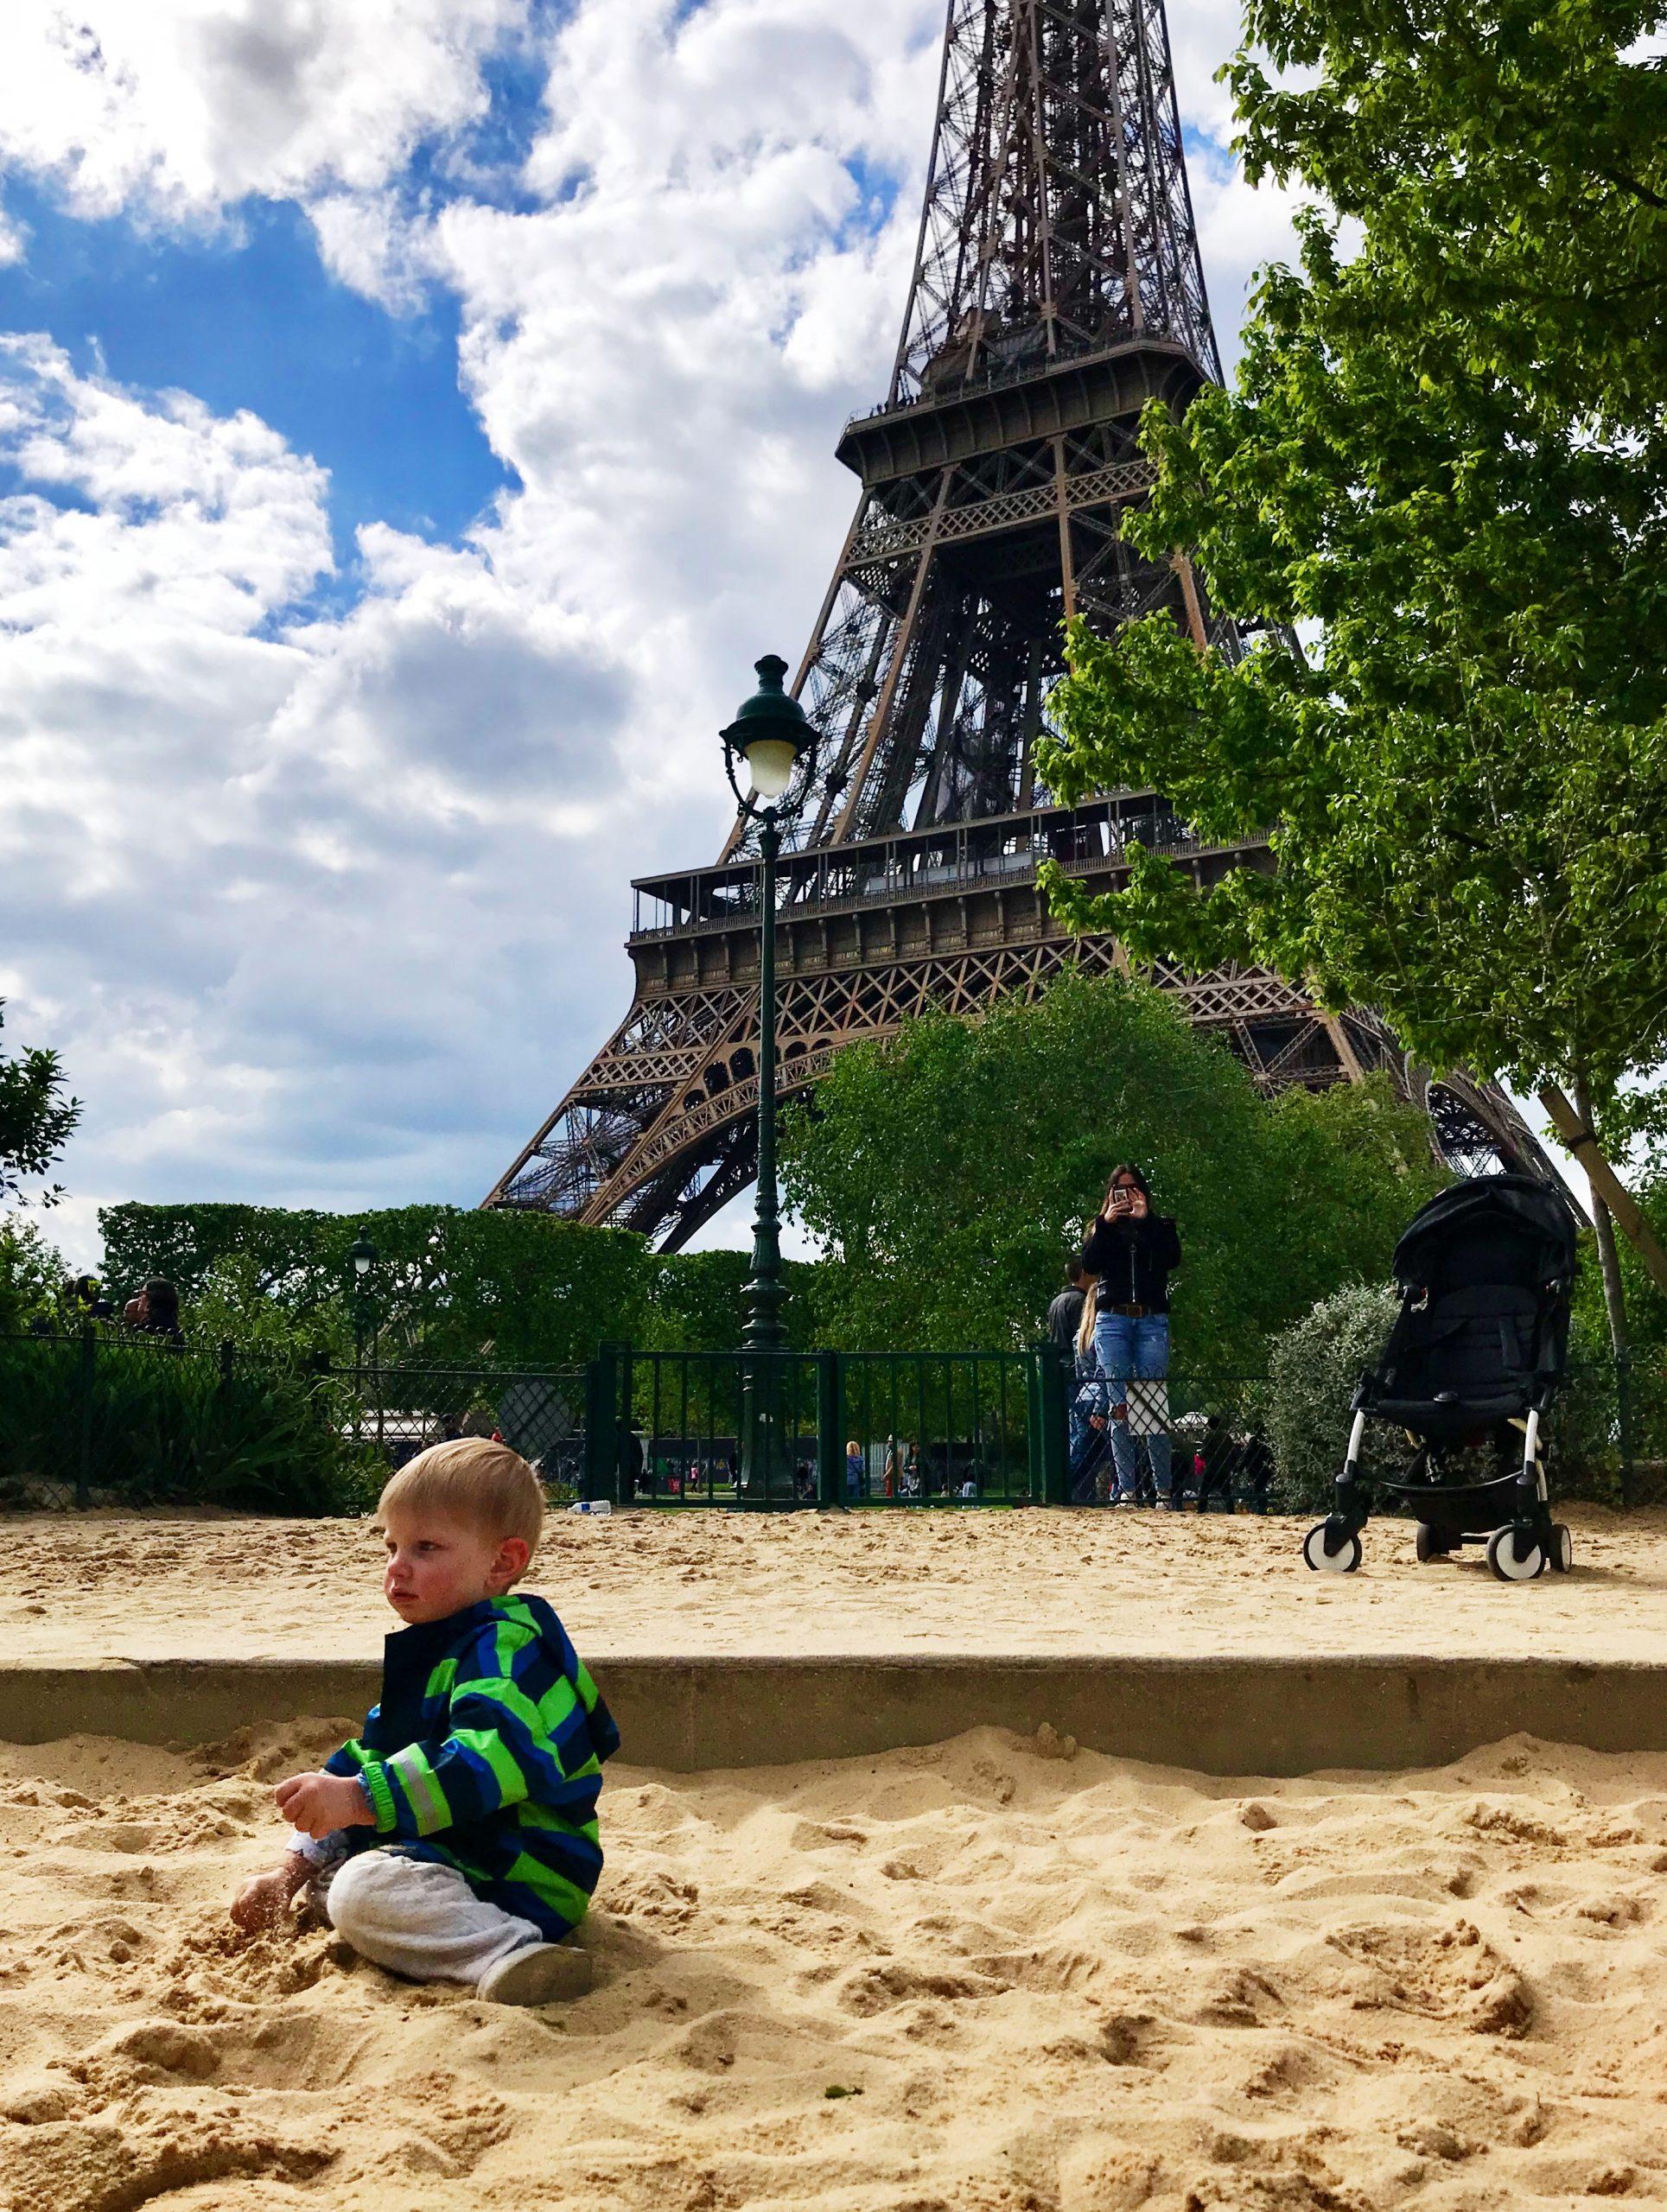 Toddlers in Paris